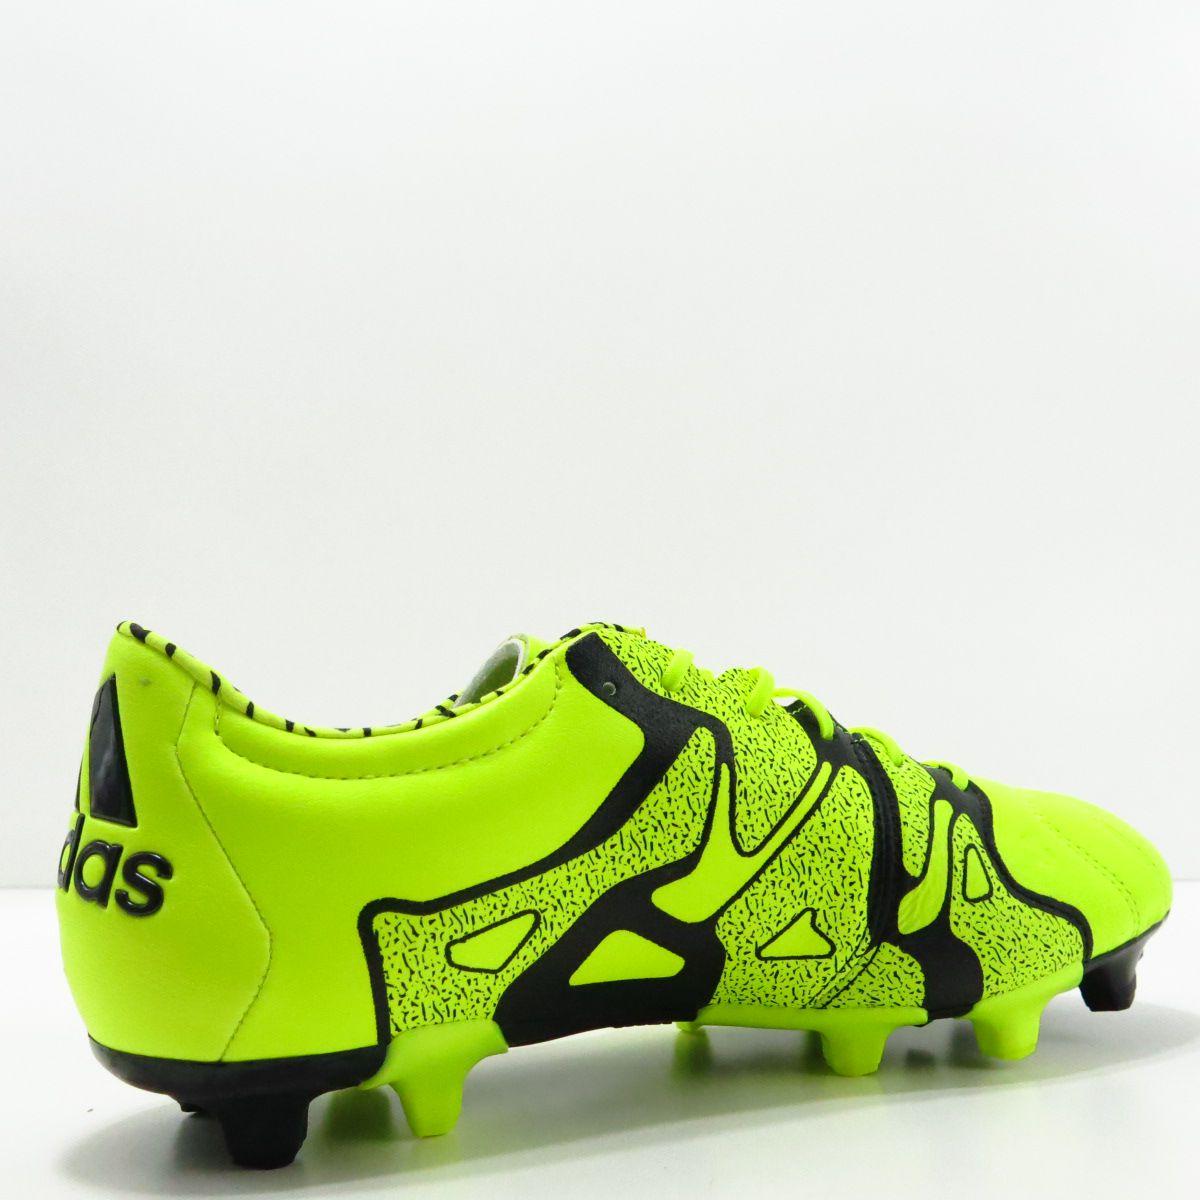 Chuteira Adidas X 15.2 FG - Couro